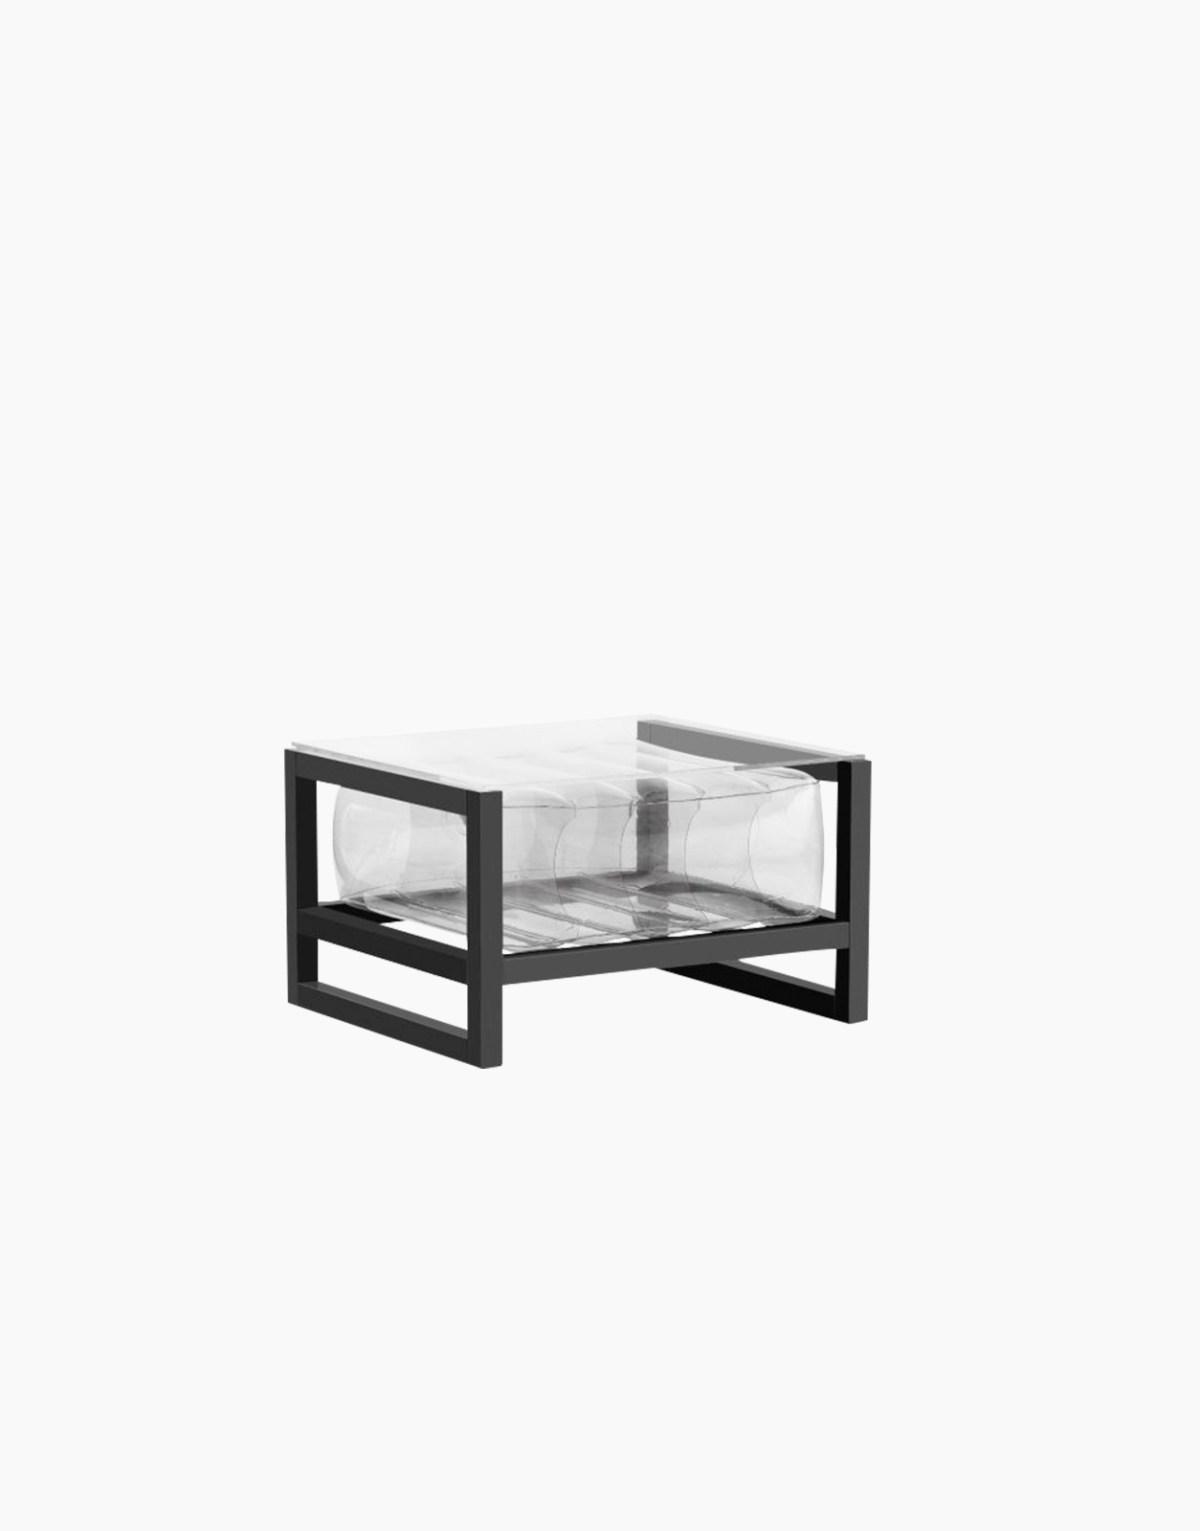 Revendeur de Mojow solution design fr mobilier table basse Yoko transparent